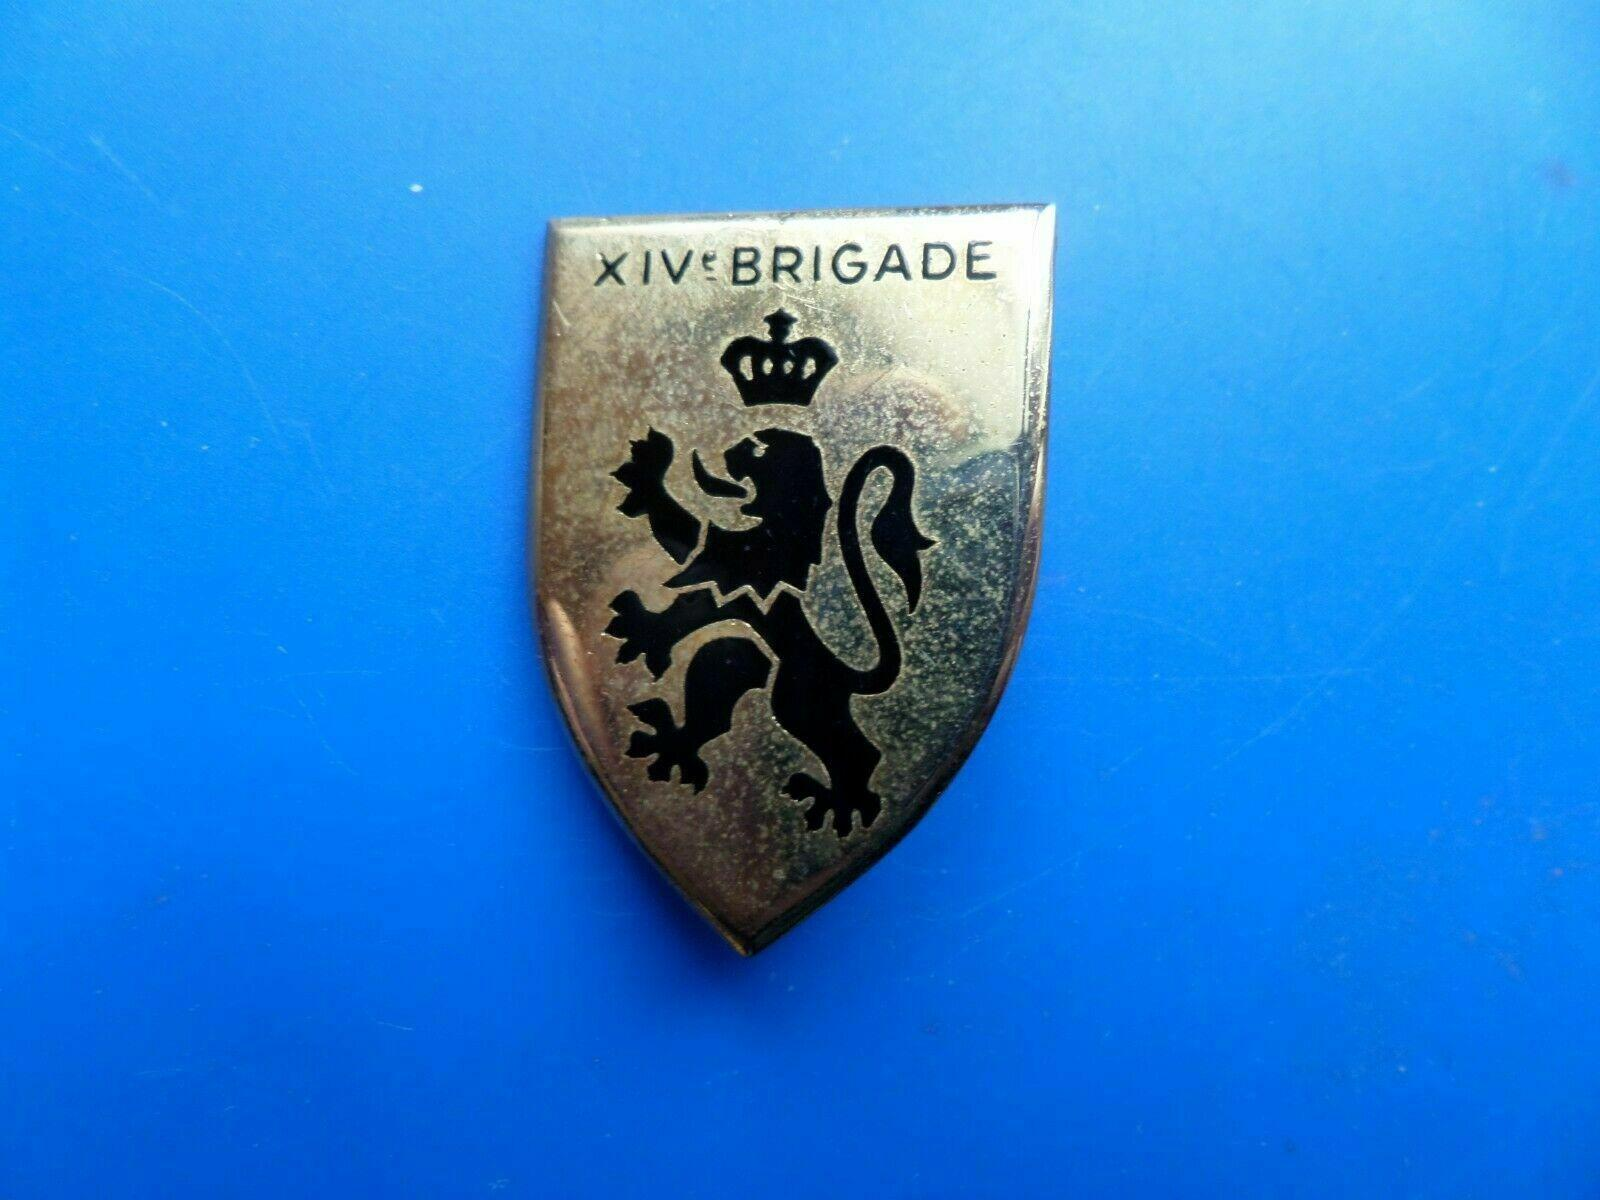 Xivbrigade